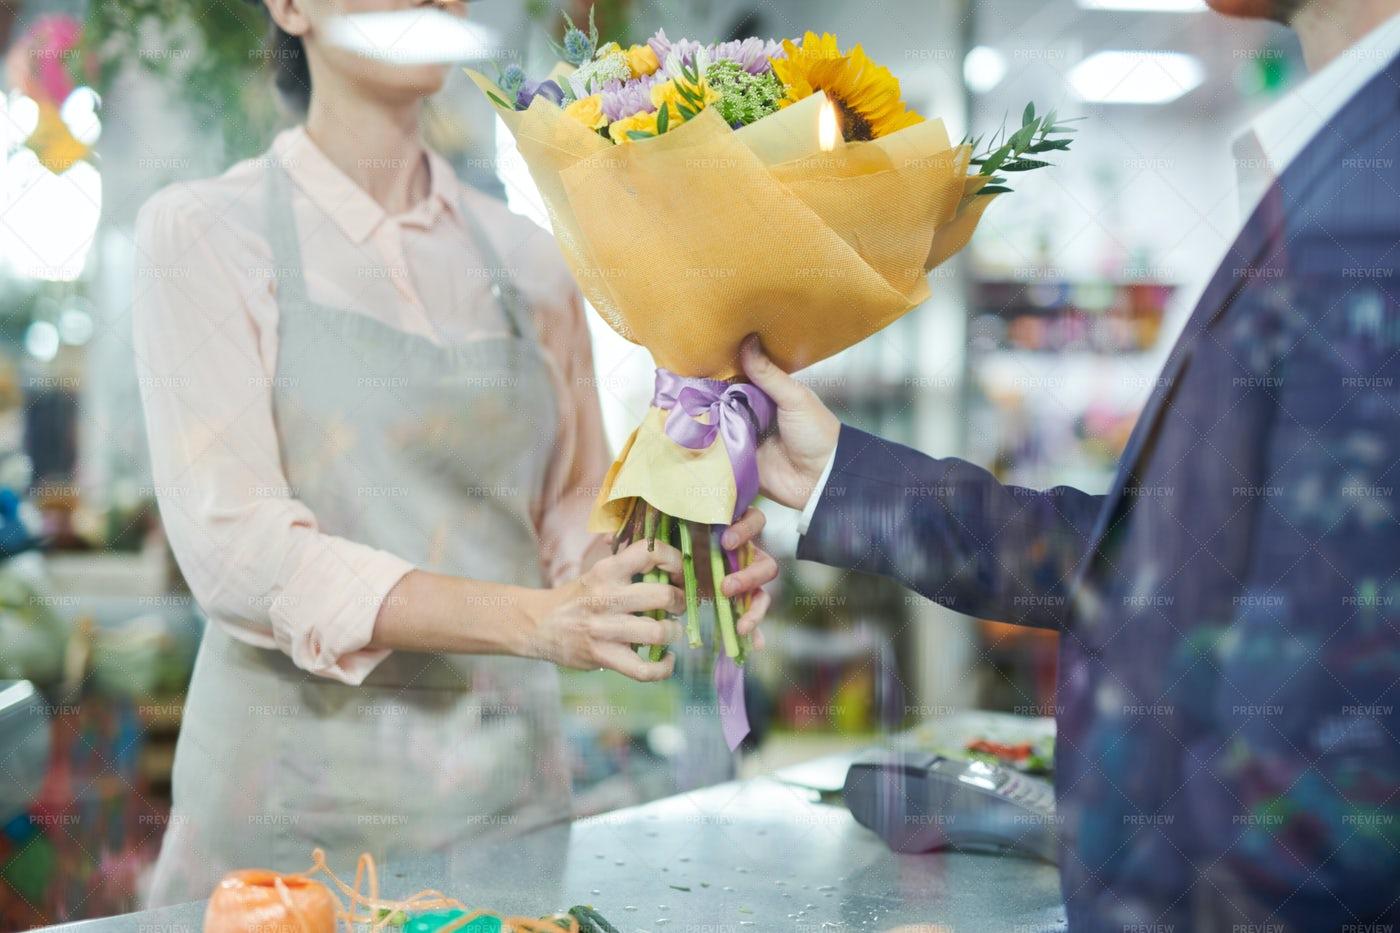 Man Buying Flowers: Stock Photos